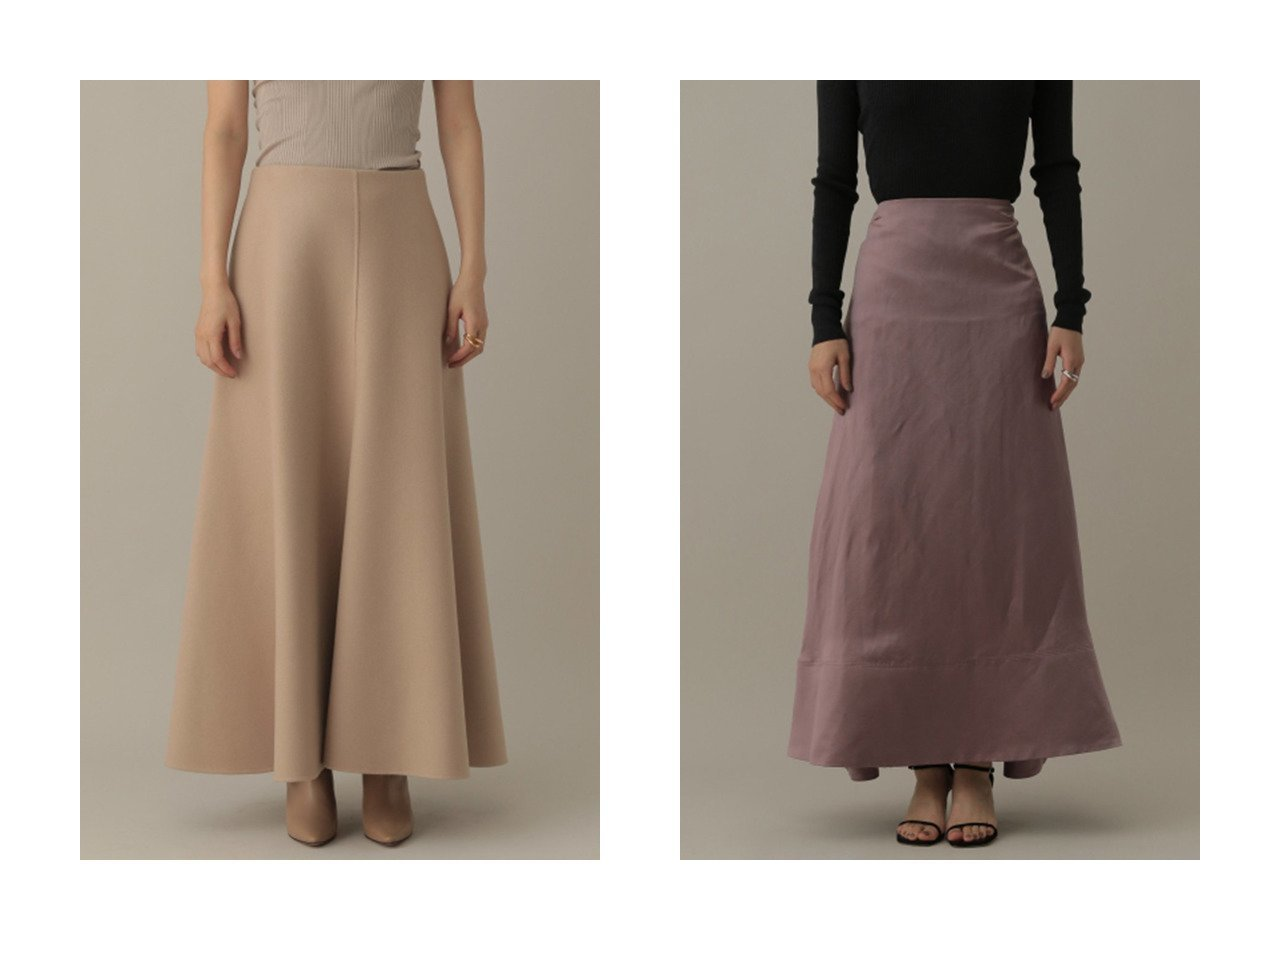 【Chaos/カオス】のスーペリアロッタスカート&マンサリーロスロングスカート 【スカート】おすすめ!人気、トレンド・レディースファッションの通販 おすすめで人気の流行・トレンド、ファッションの通販商品 インテリア・家具・メンズファッション・キッズファッション・レディースファッション・服の通販 founy(ファニー) https://founy.com/ ファッション Fashion レディースファッション WOMEN スカート Skirt ロングスカート Long Skirt 2020年 2020 2020-2021秋冬・A/W AW・Autumn/Winter・FW・Fall-Winter/2020-2021 2021年 2021 2021-2022秋冬・A/W AW・Autumn/Winter・FW・Fall-Winter・2021-2022 A/W・秋冬 AW・Autumn/Winter・FW・Fall-Winter エレガント サテン シルク シンプル リネン ロング おすすめ Recommend メルトン 人気 |ID:crp329100000056314